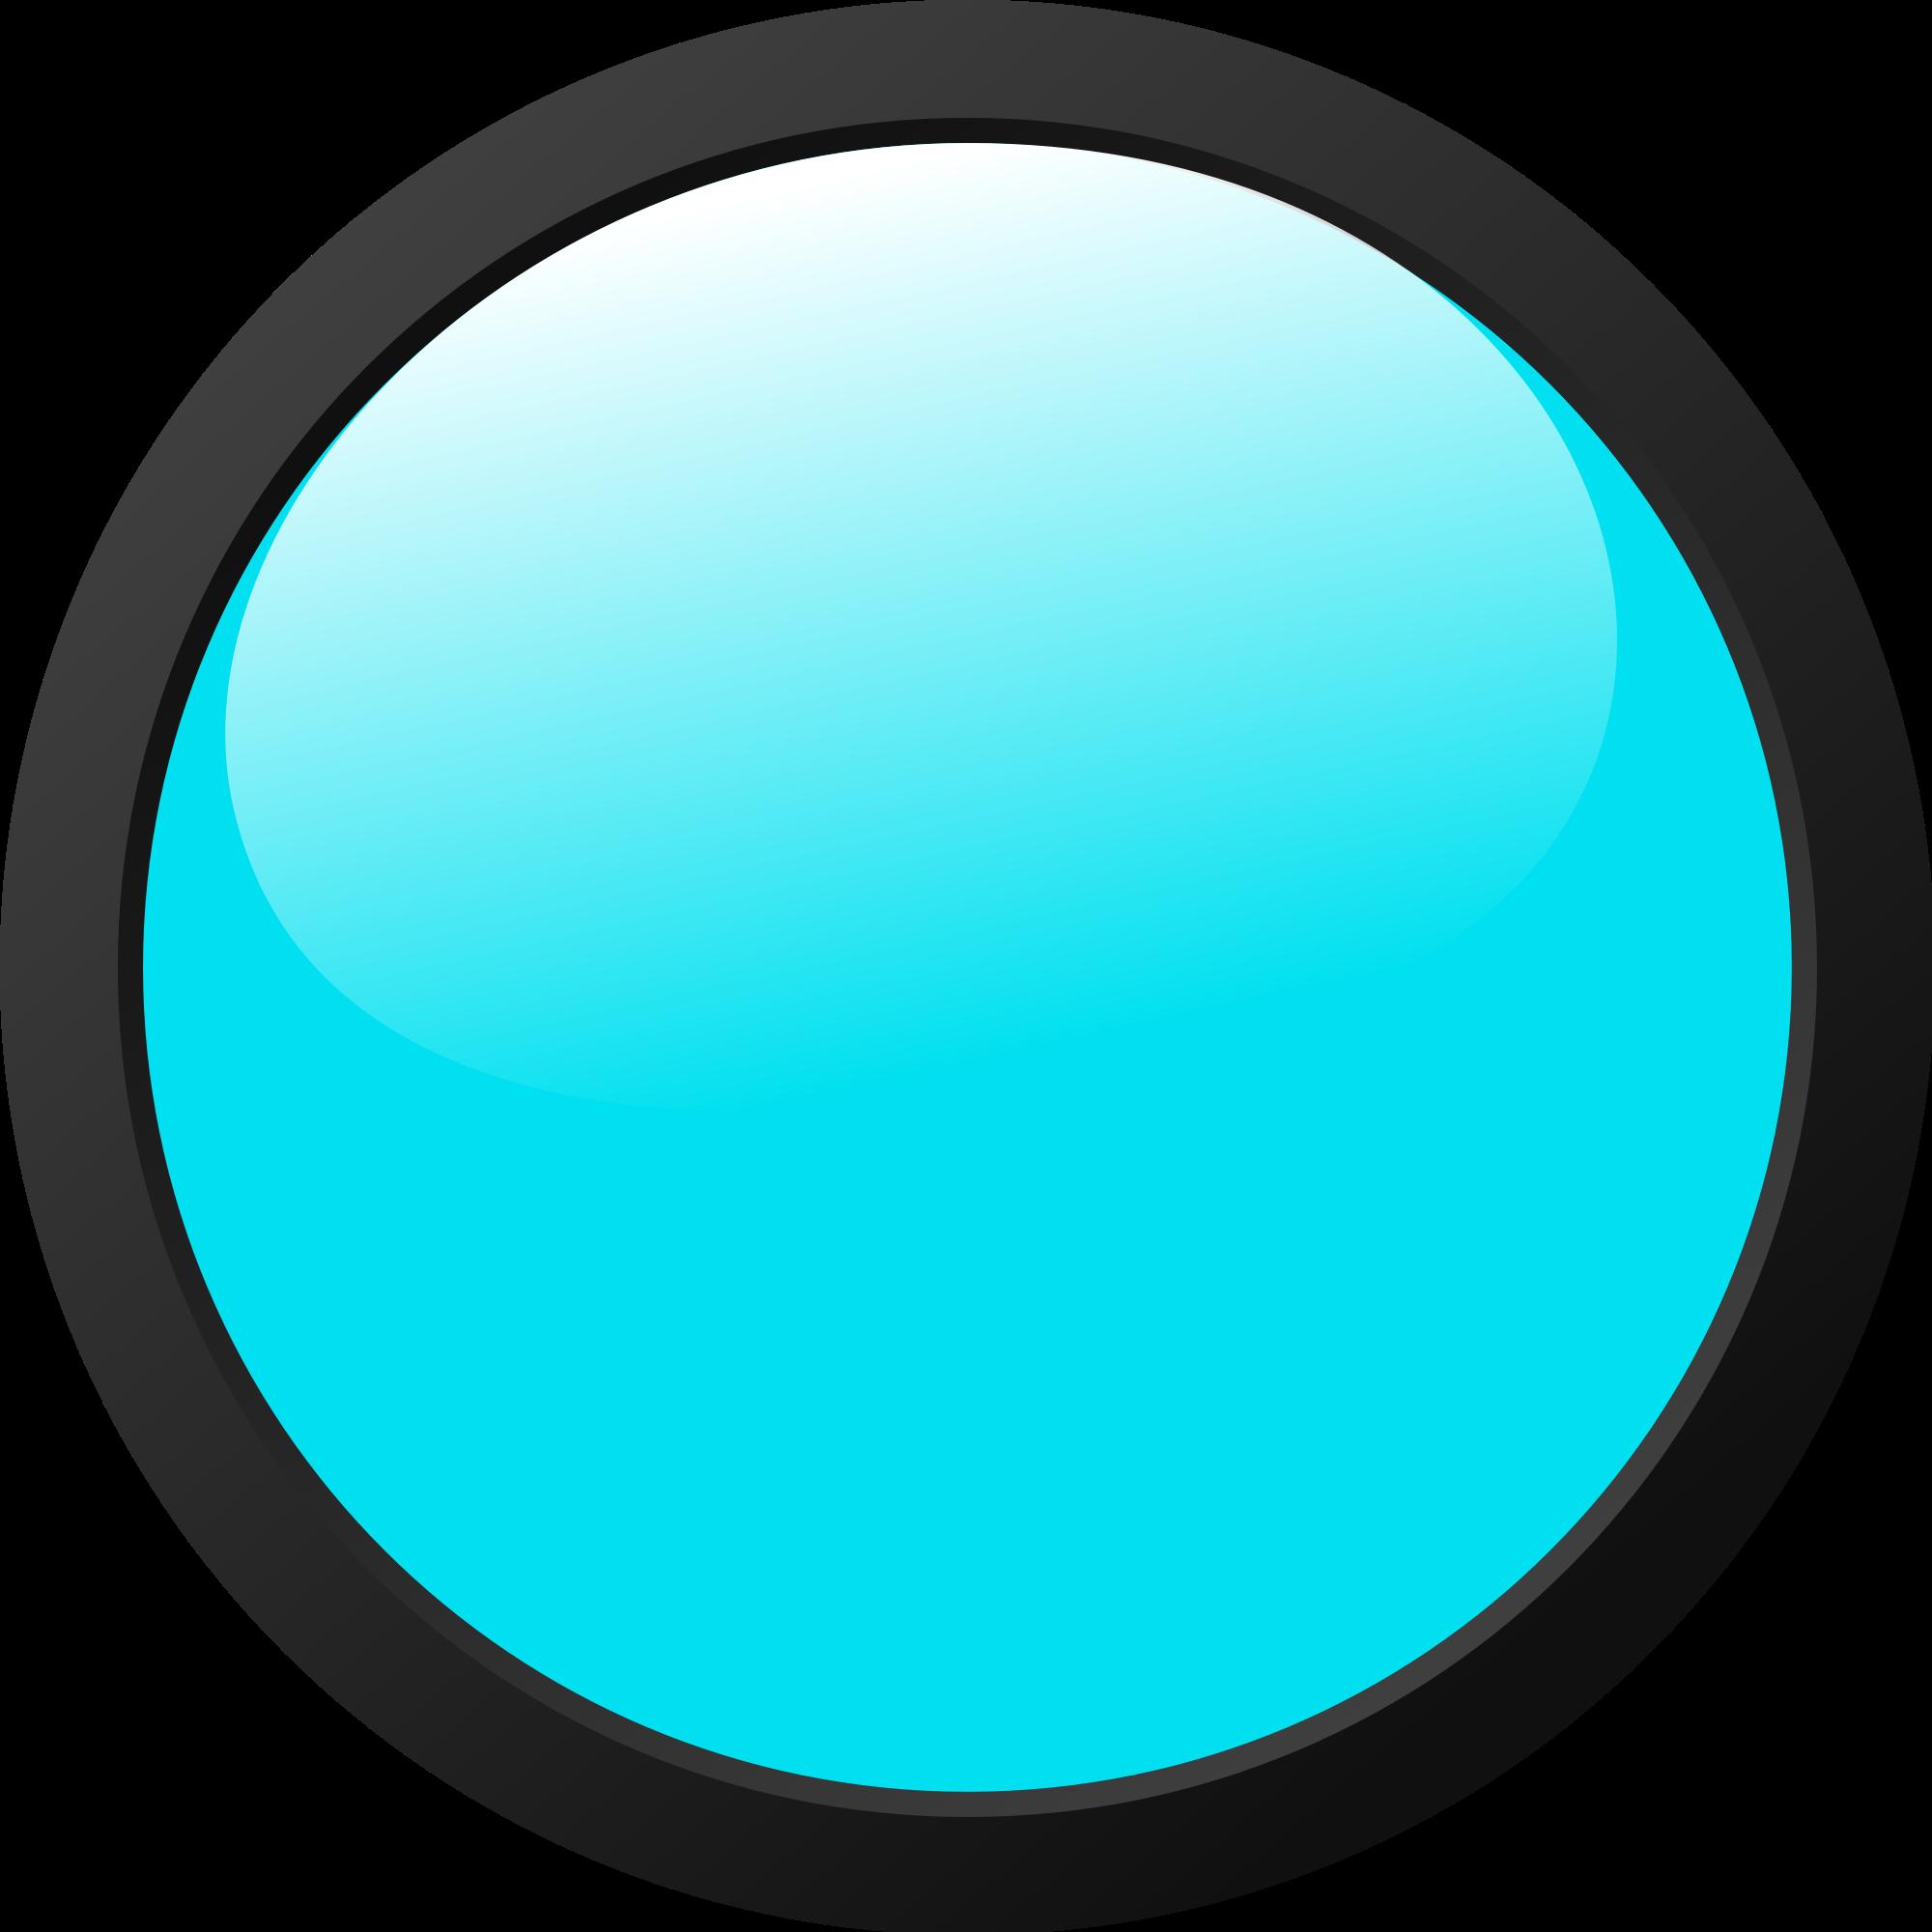 File:Cyan Light Icon.svg.